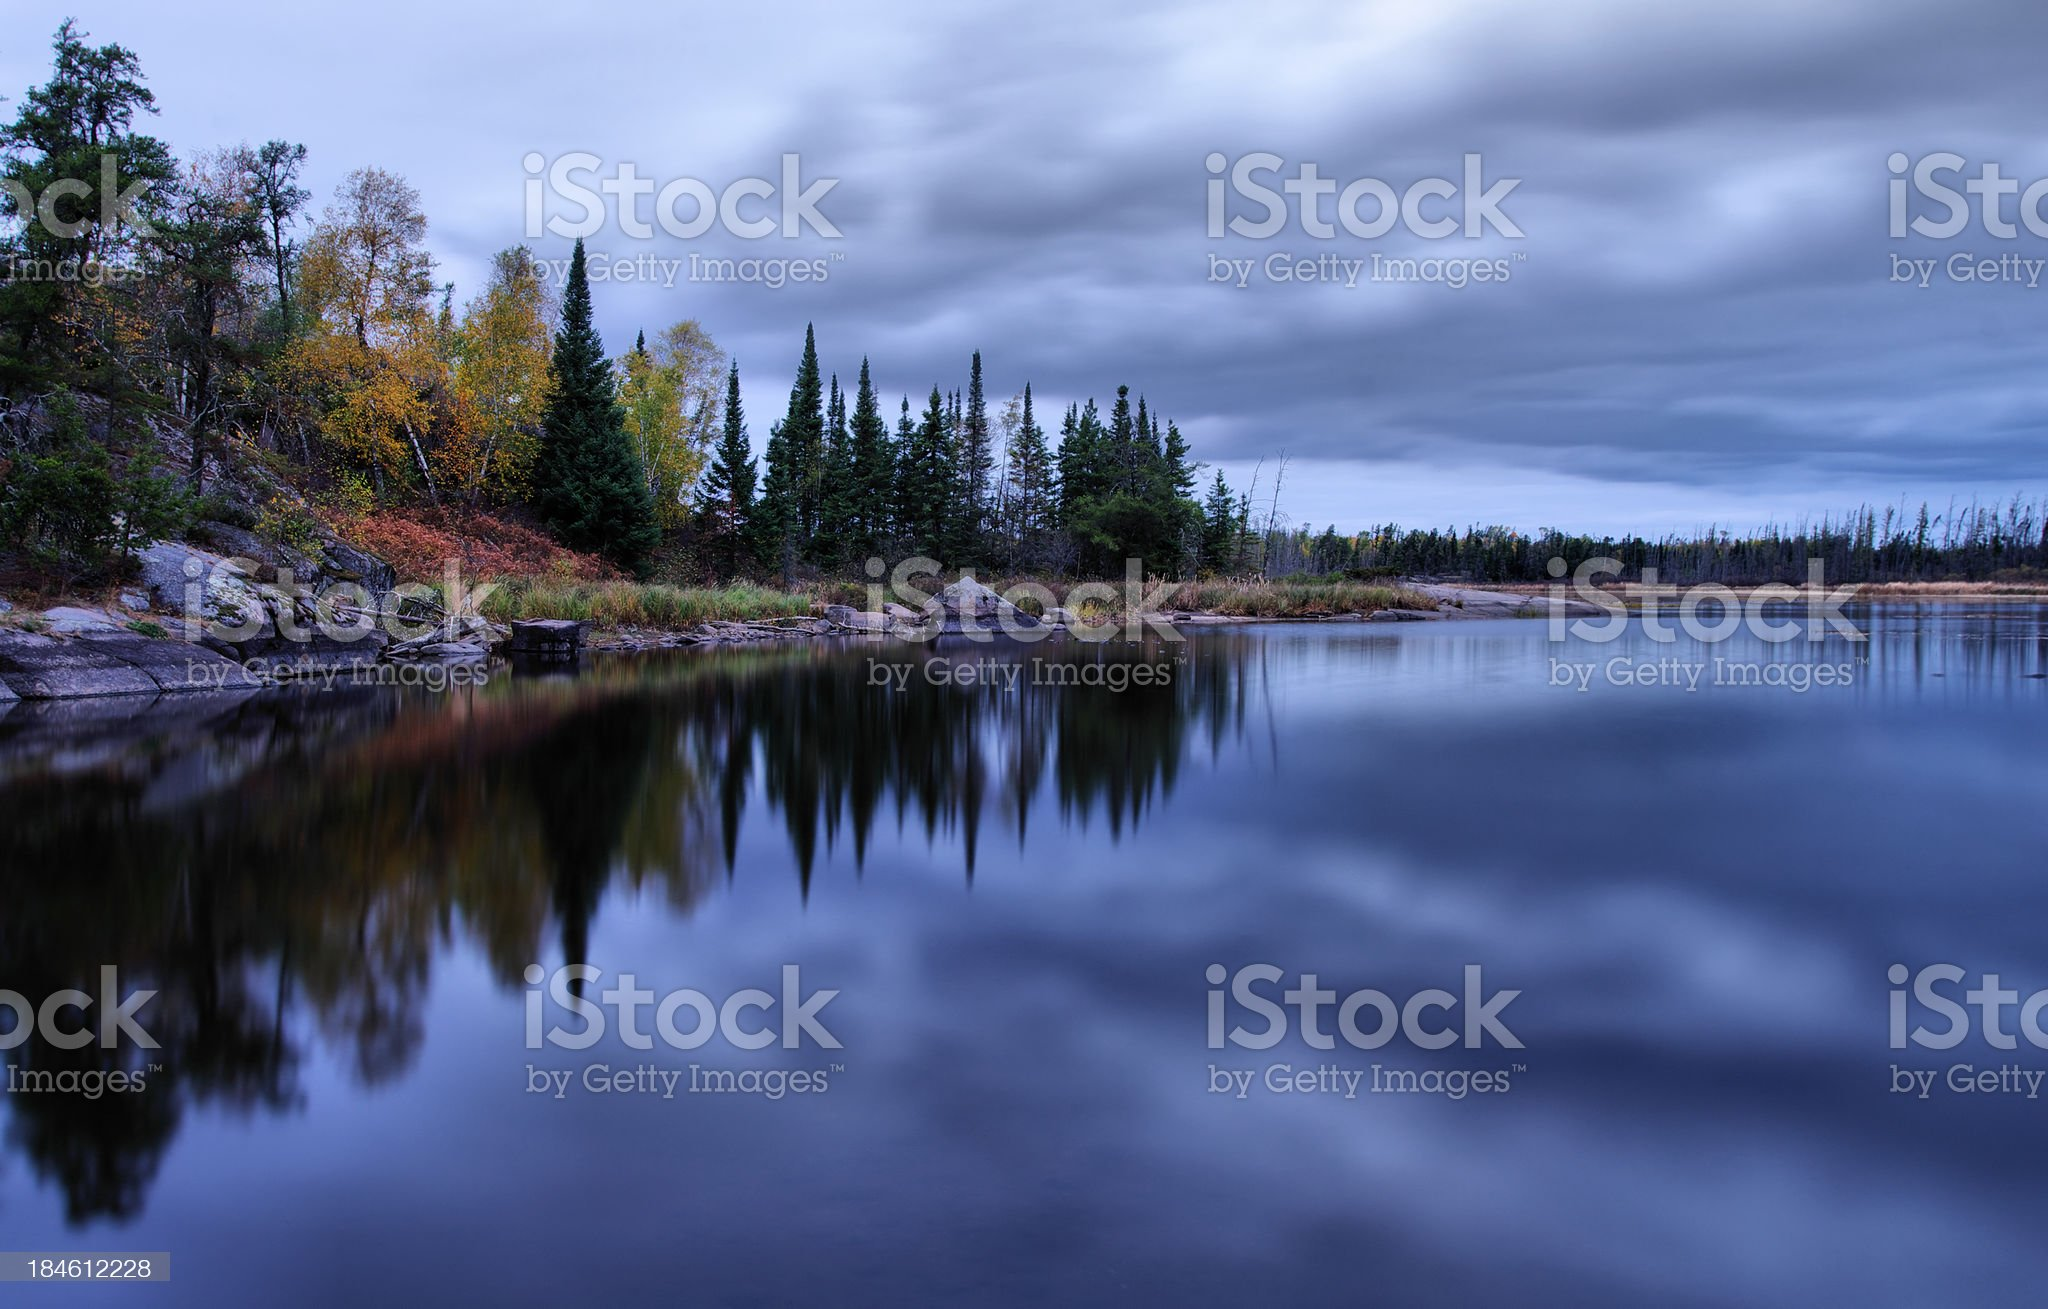 Whtieshell Provincial Park royalty-free stock photo